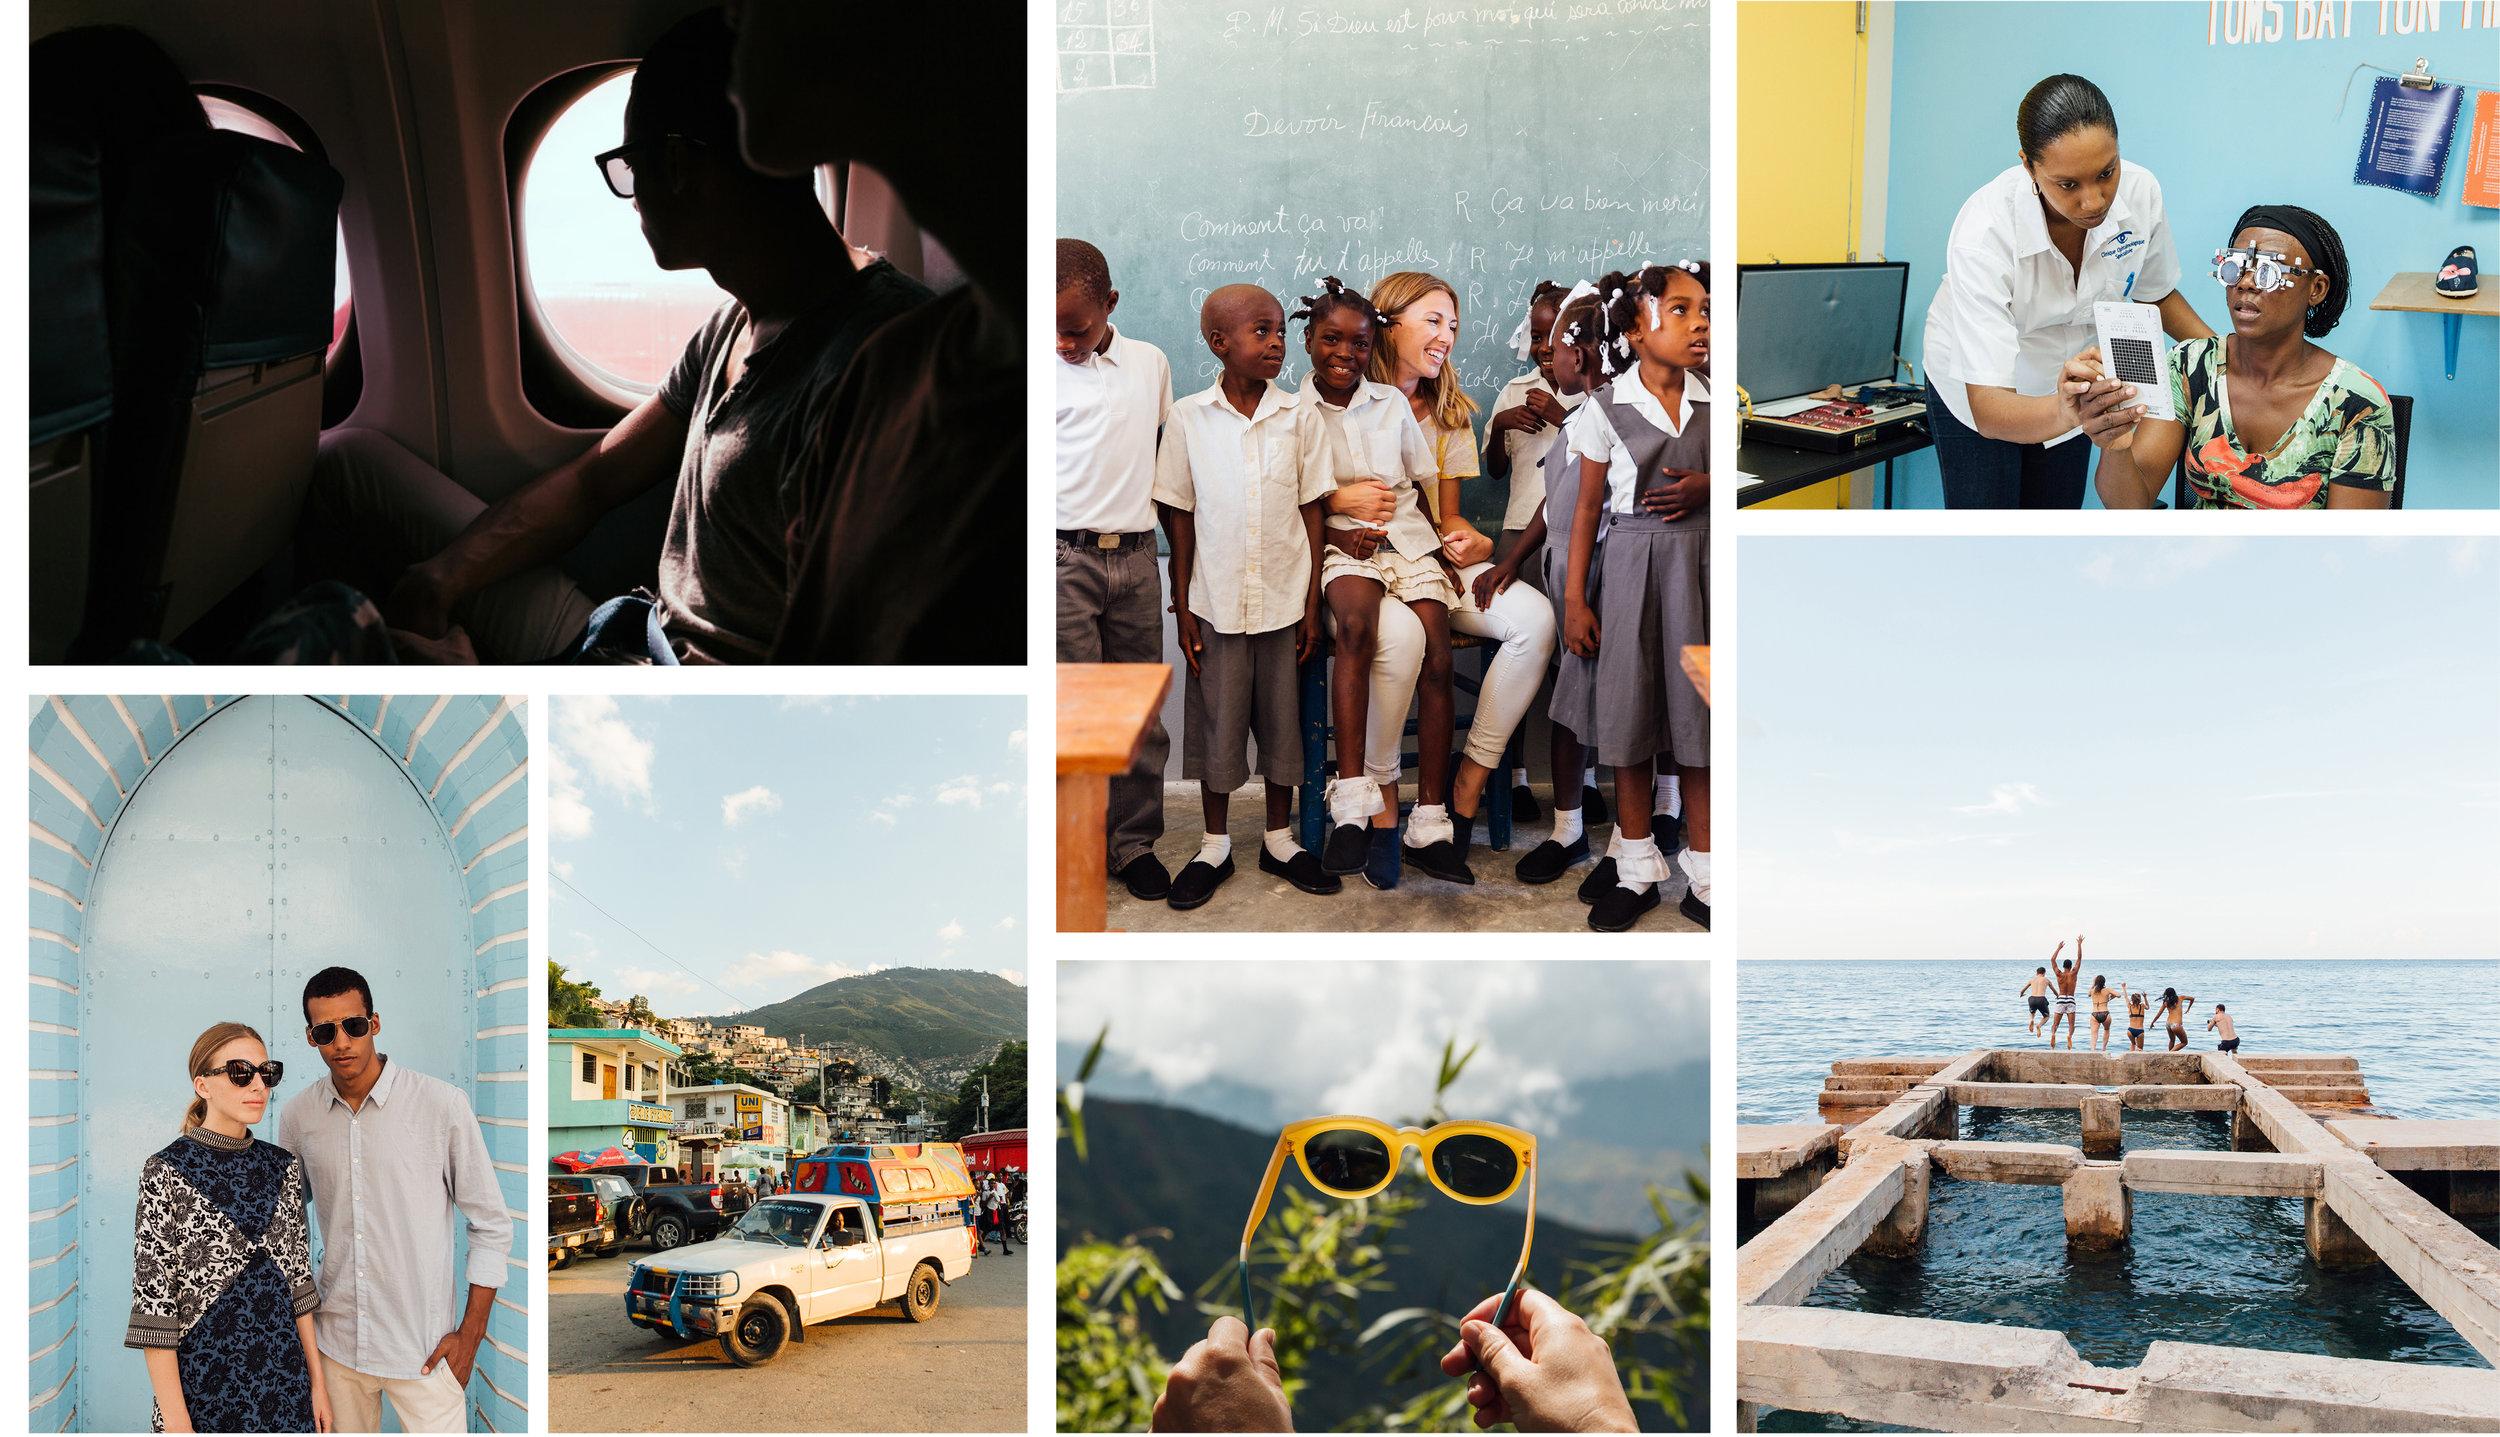 JWDTAN_Haiti_Collages3.jpg